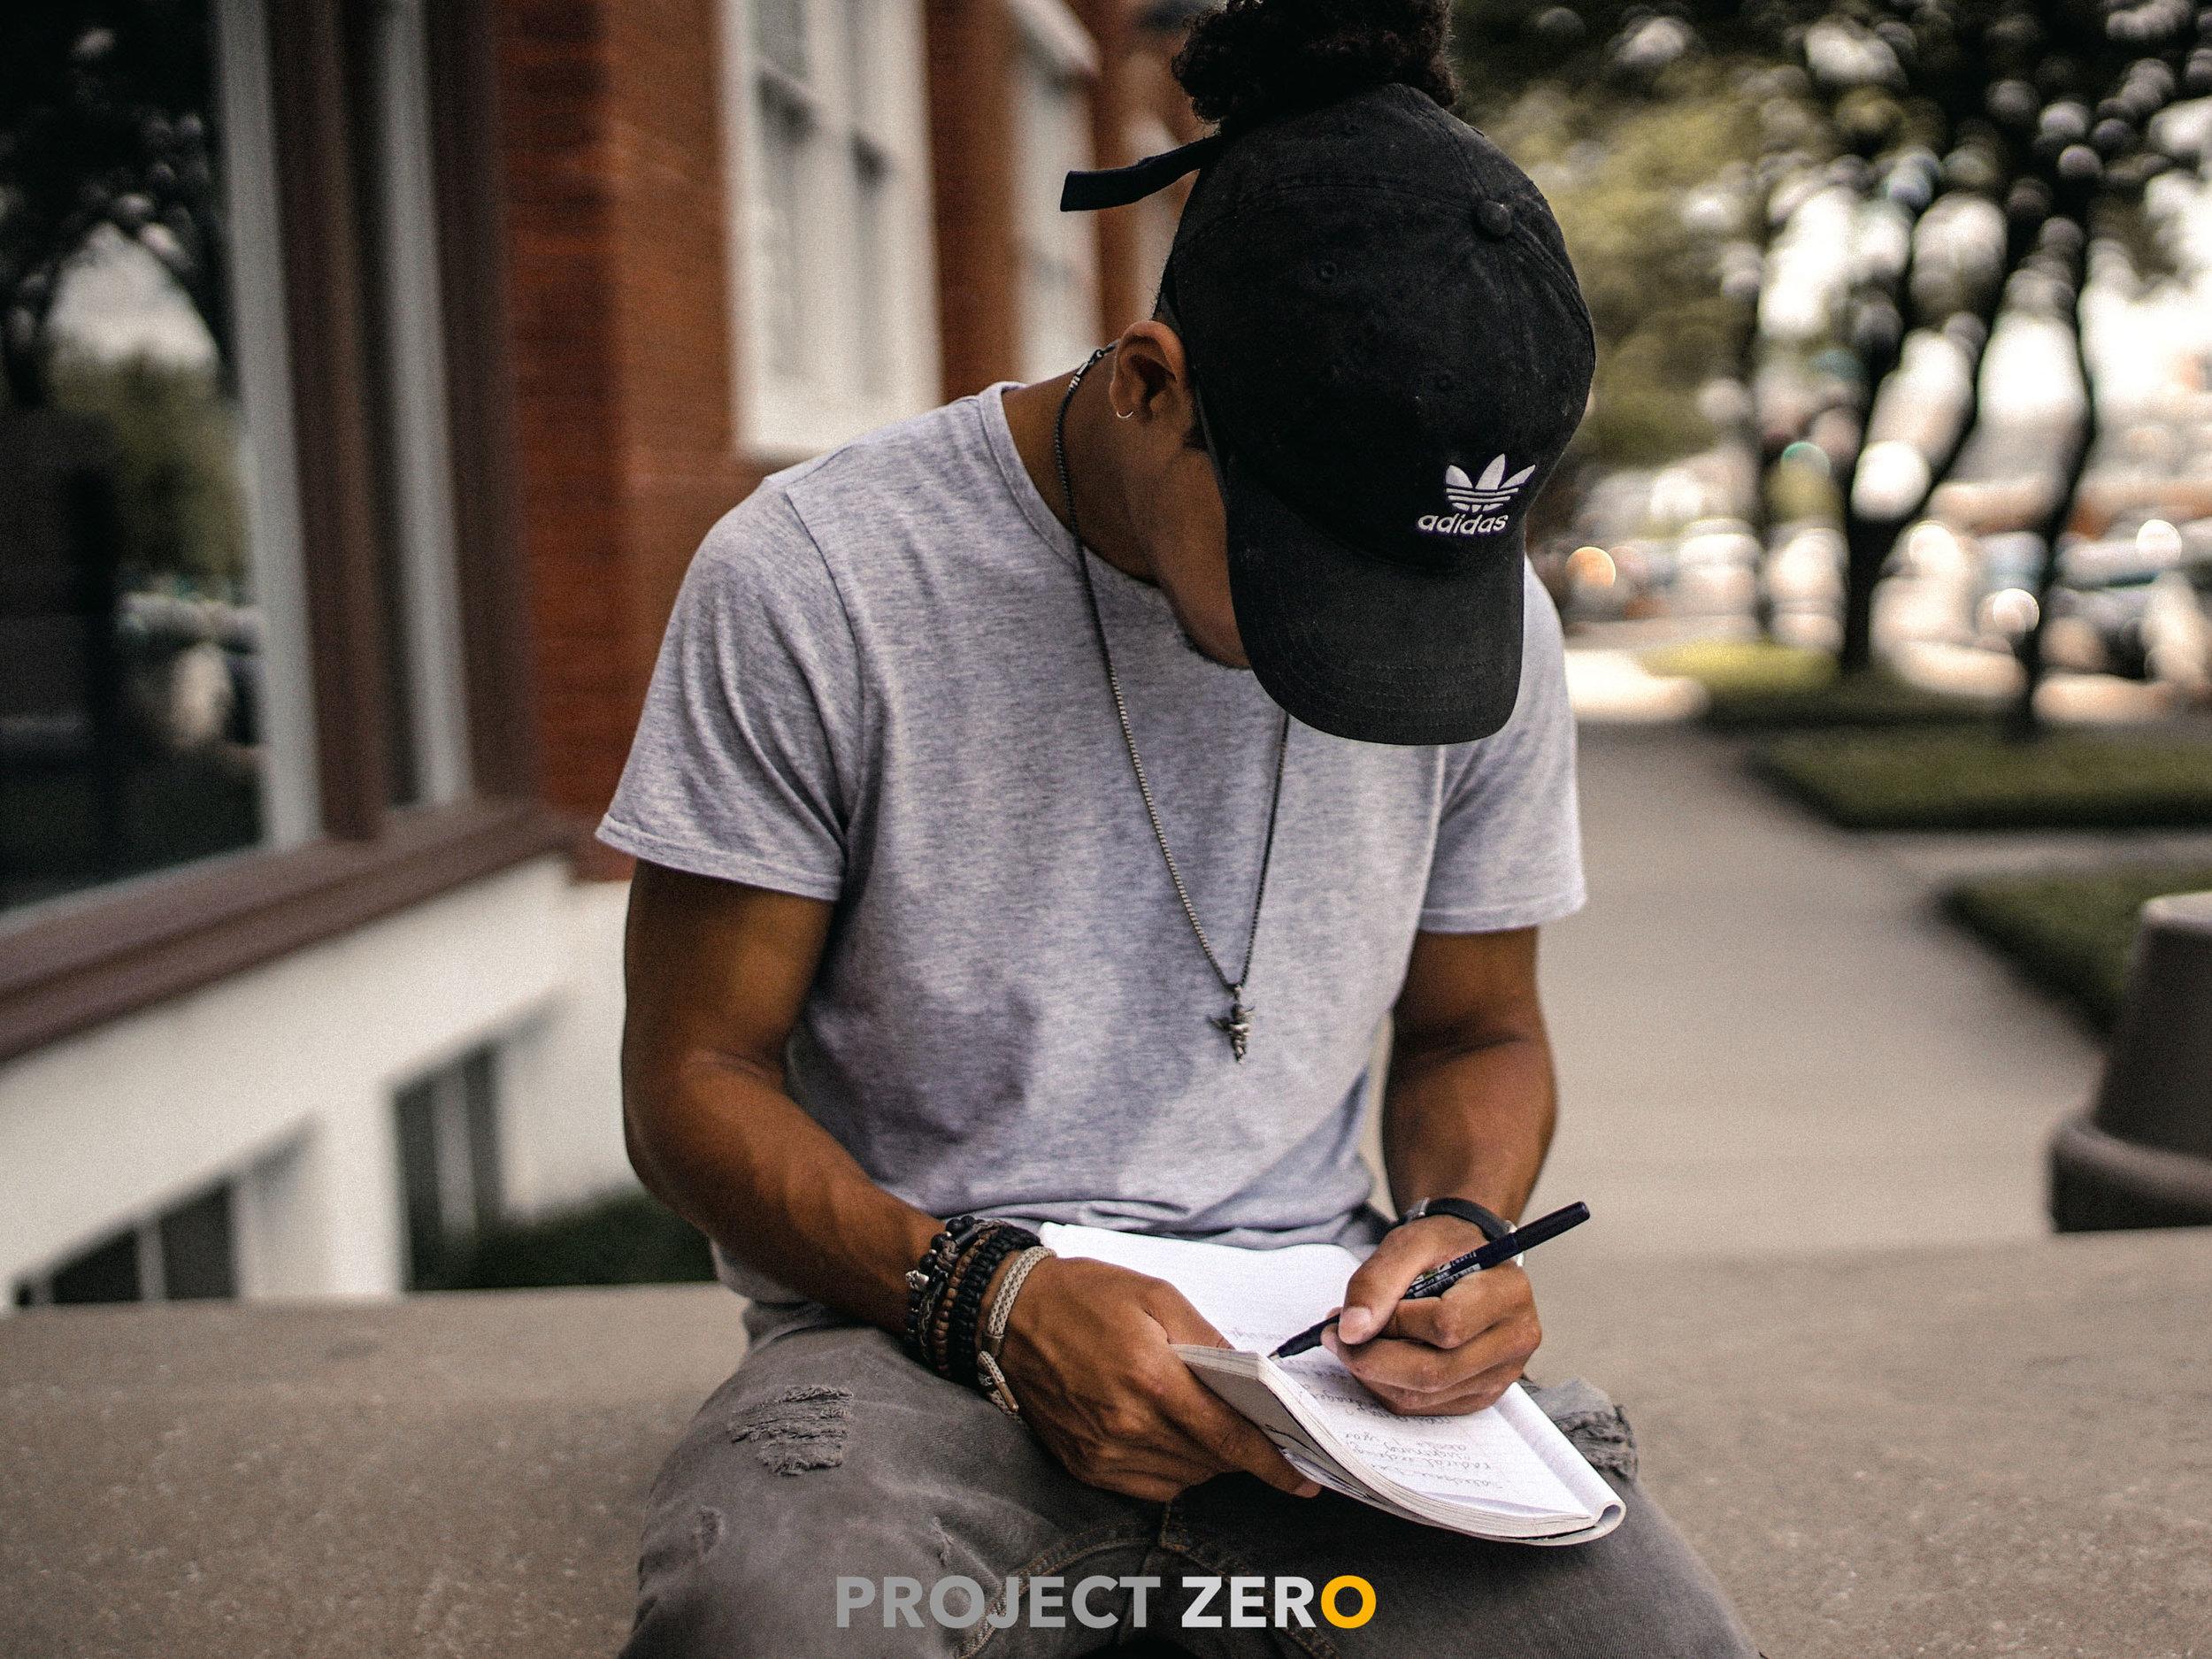 project-zero-6.jpg